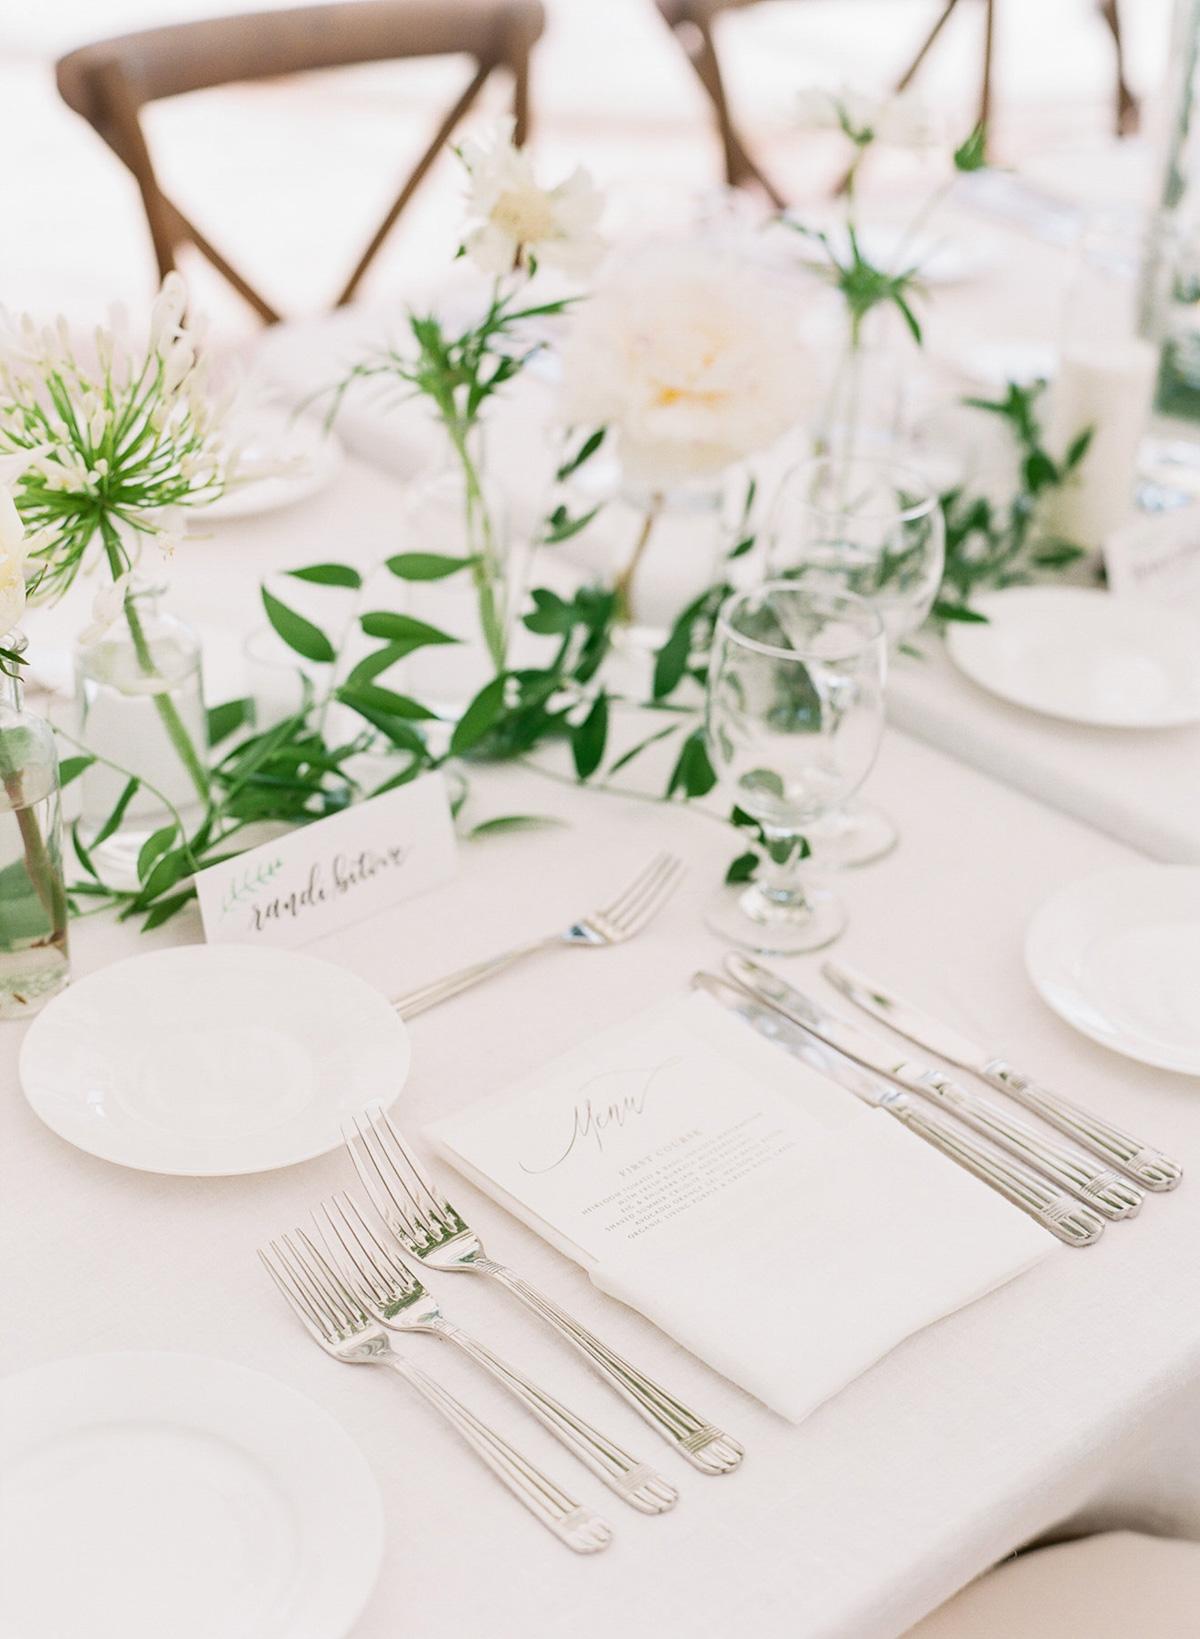 artiese-studios-vineyard-bride-swish-list-private-estate-cambridge-wedding-62.jpg